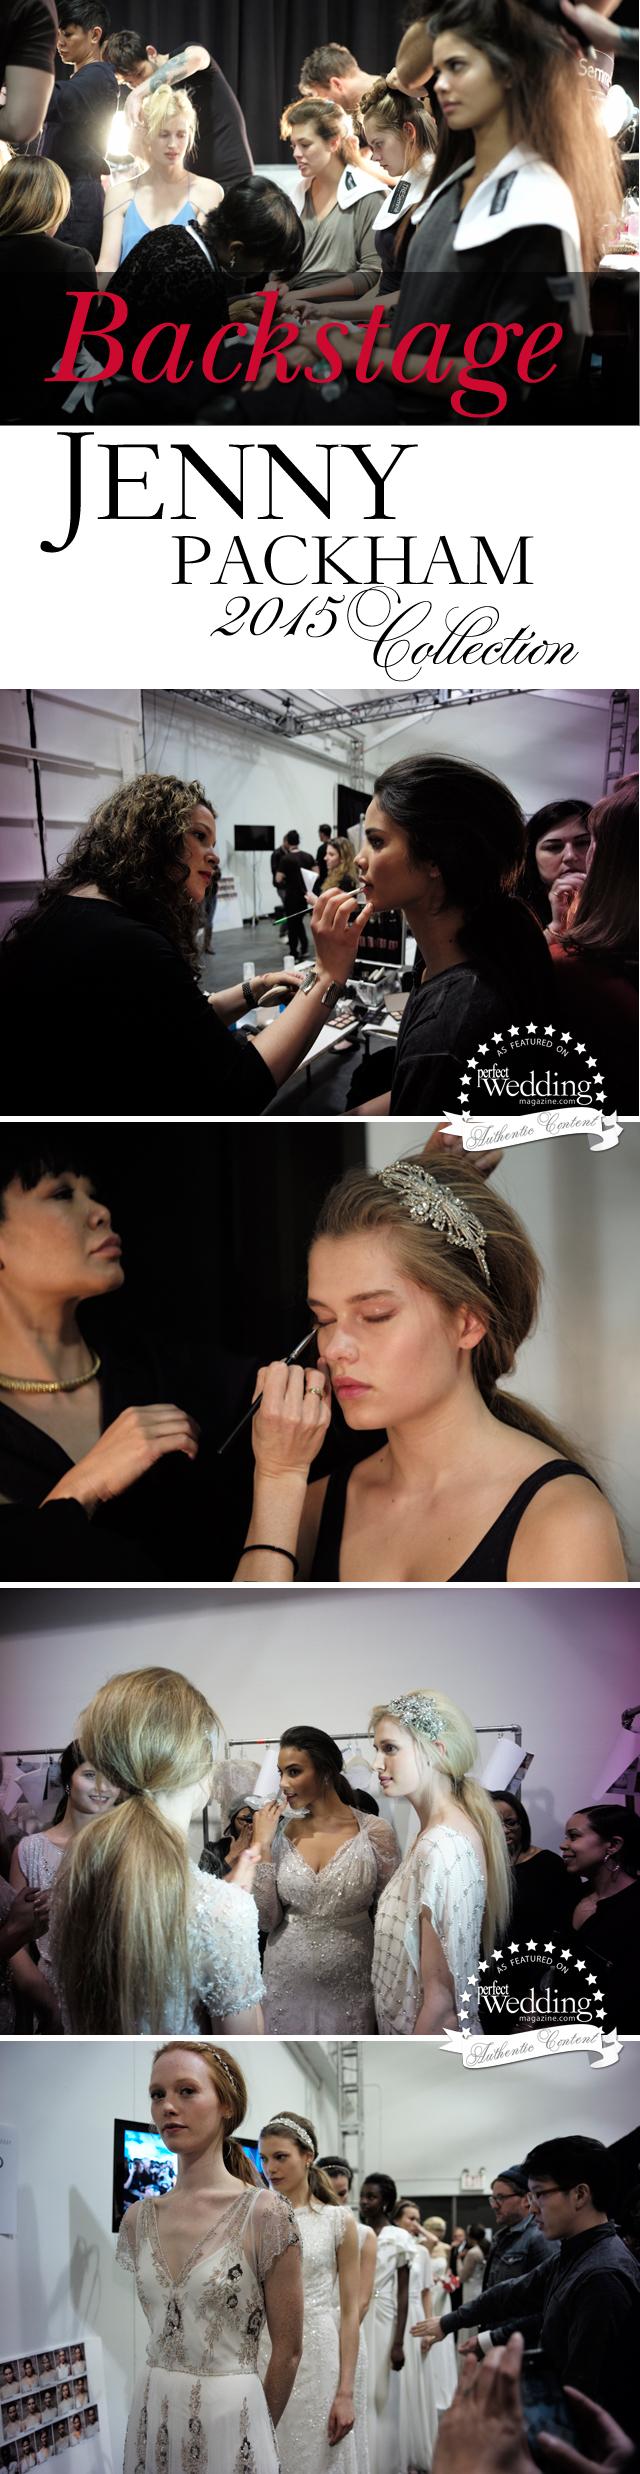 Jenny Packham, Jenny Packham 2015 bridal collection, Jenny Packham backstage bridal collection, Perfect Wedding magazine, perfect wedding magazine blog, 2015 bridal collections